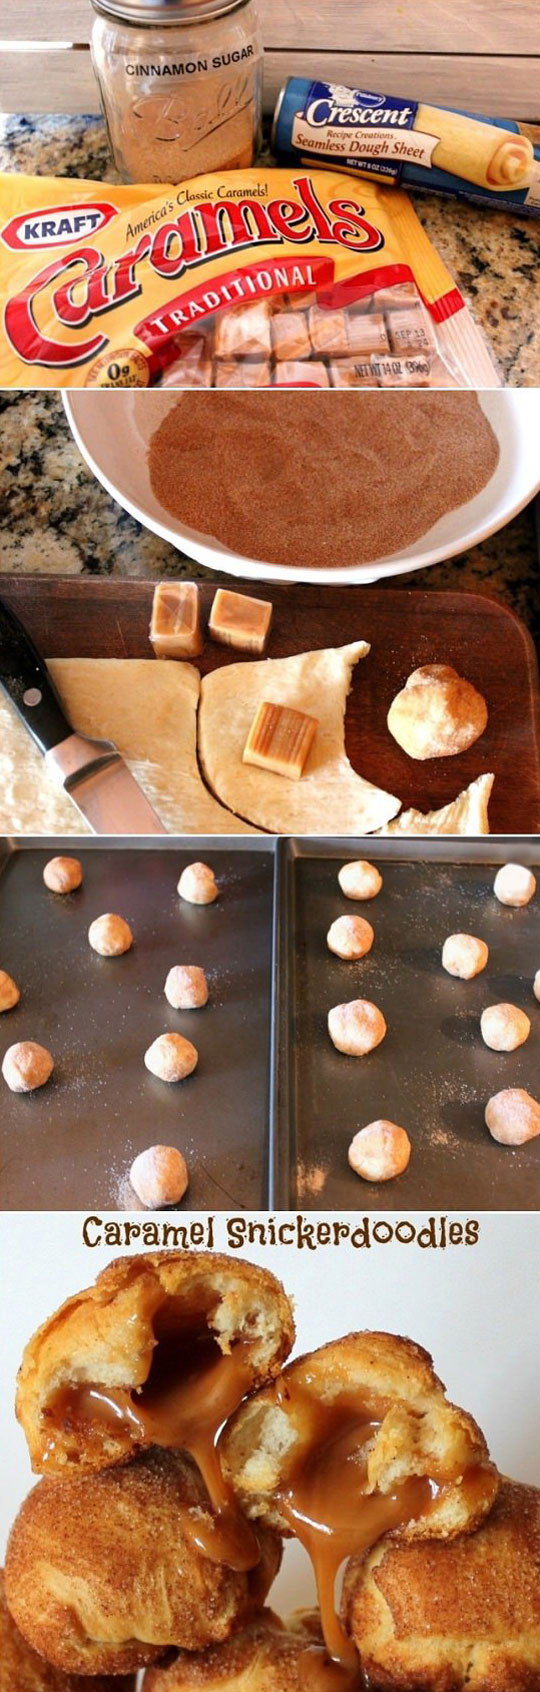 recipe-caramel-Snickers-cinnamon